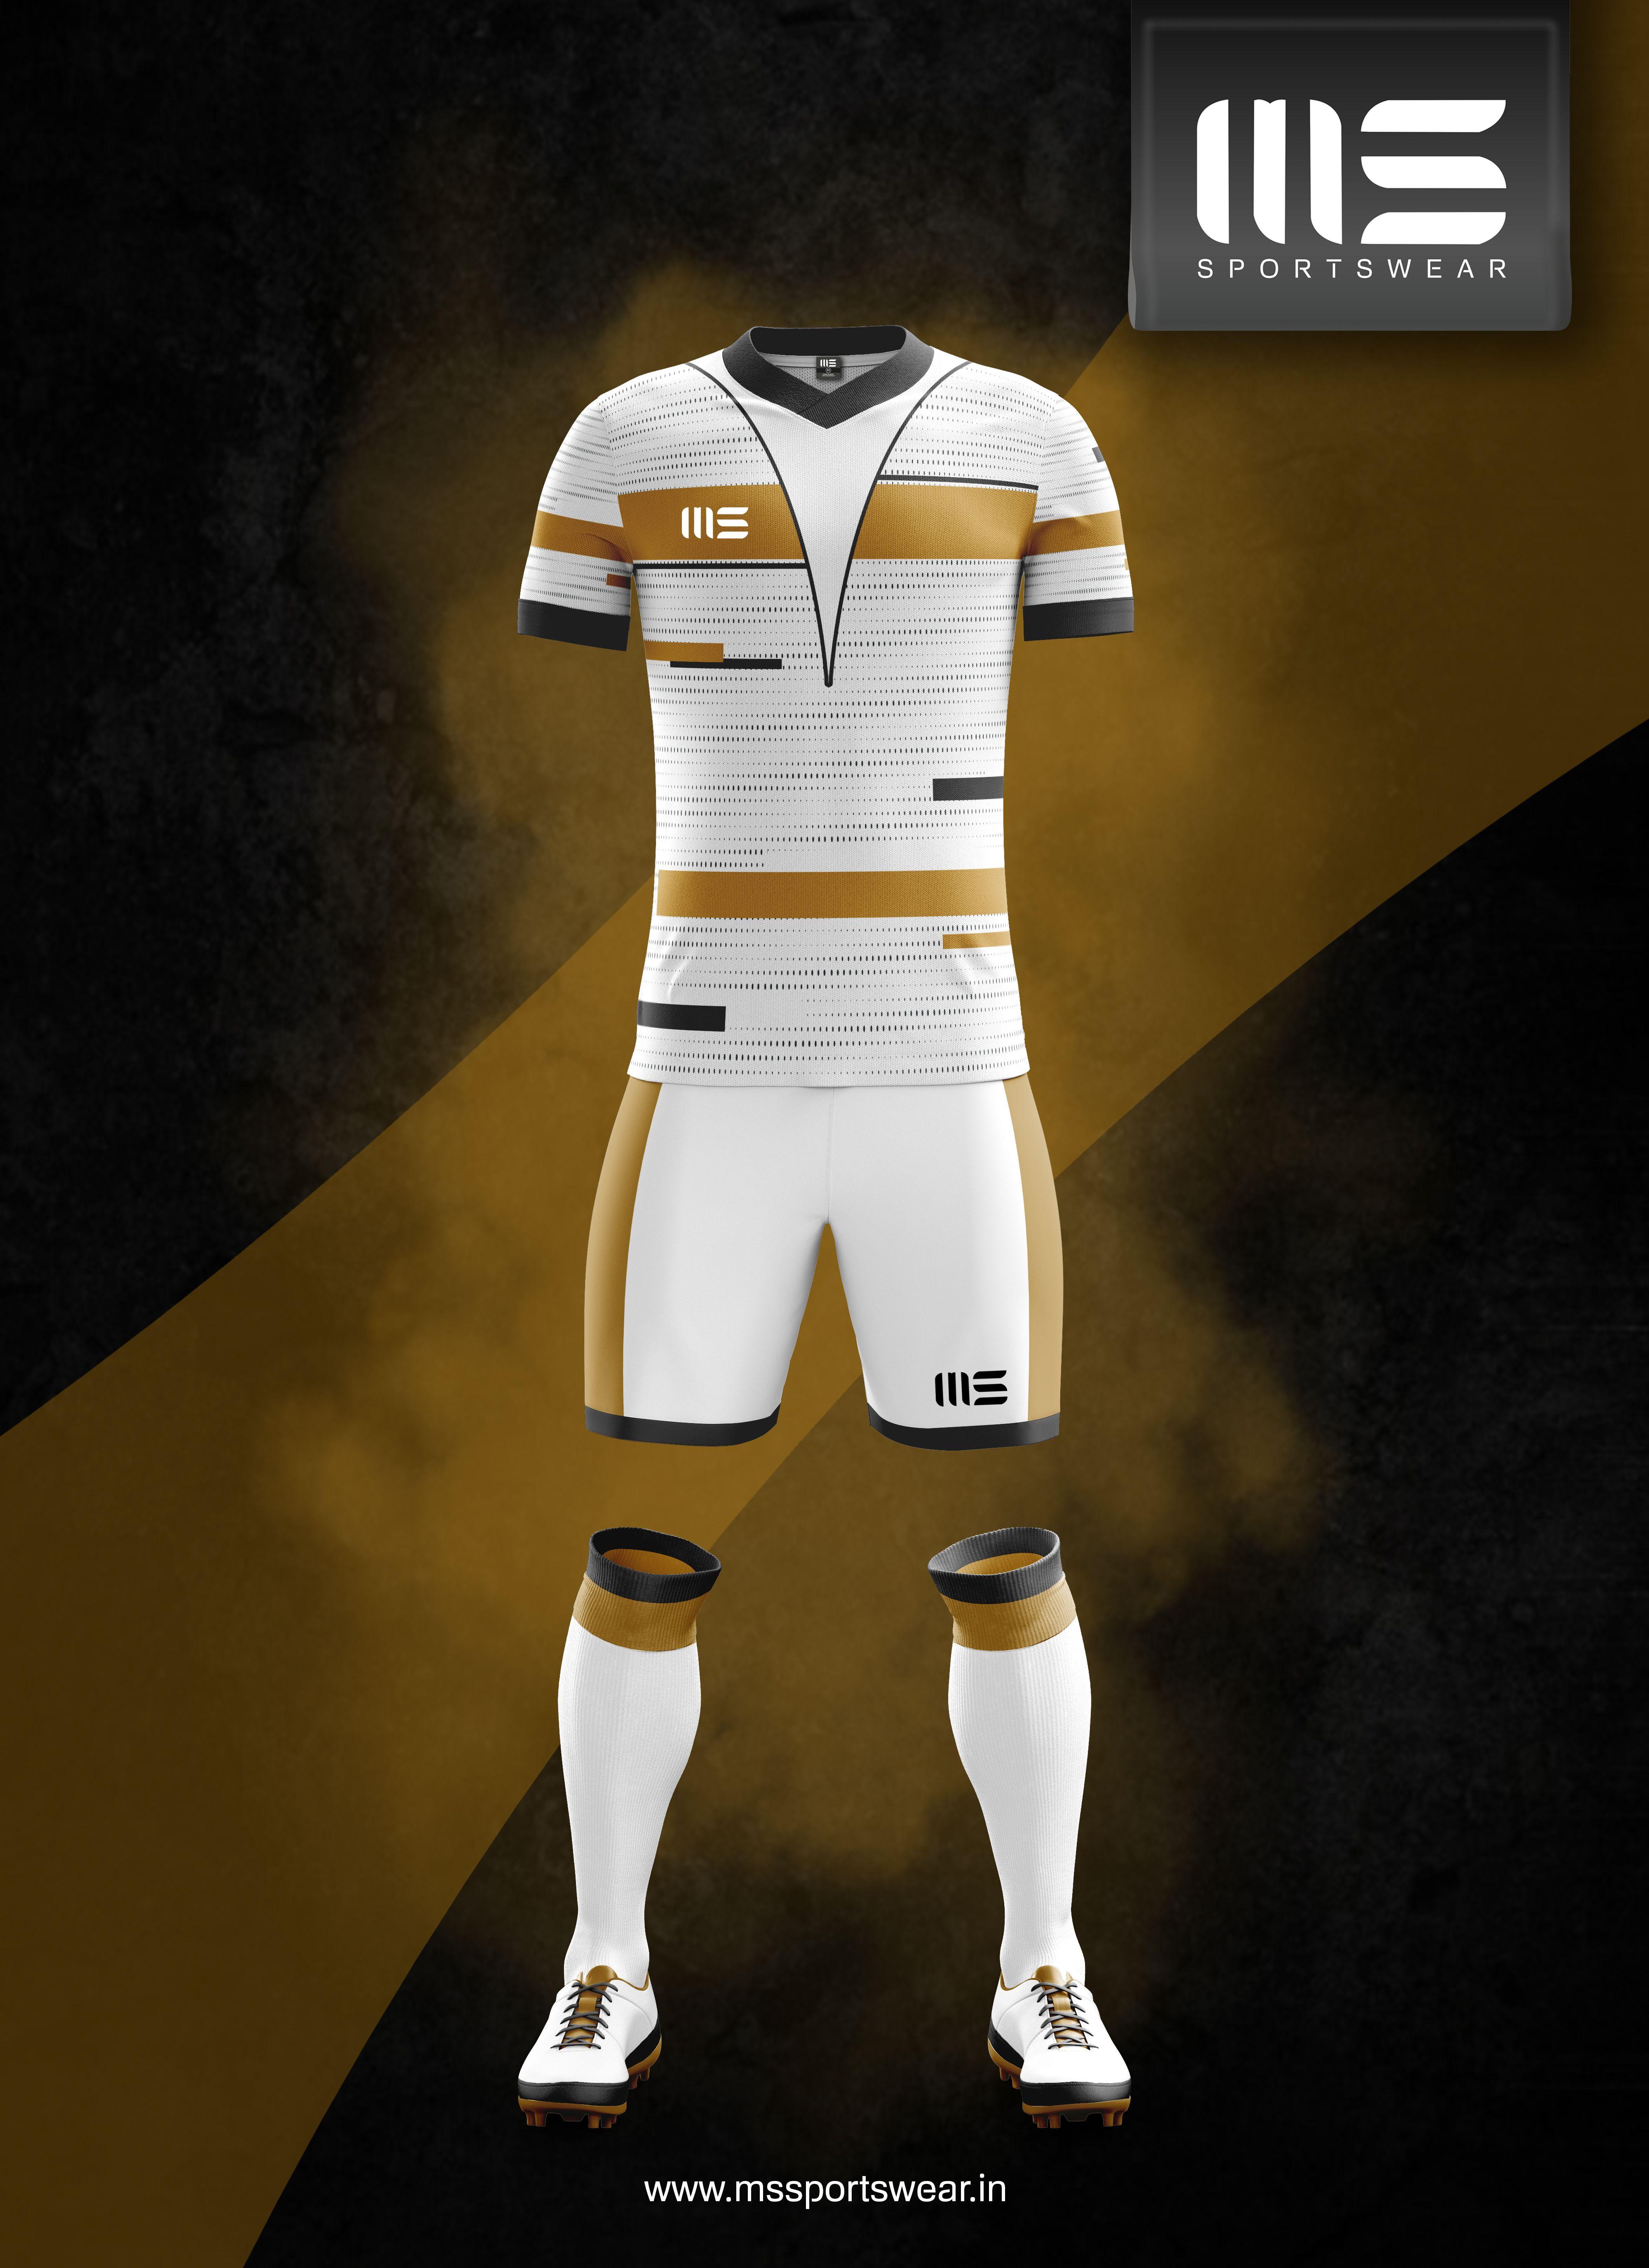 MS SPORTSWEAR DESIGNS   Camisas de futebol, Uniformes